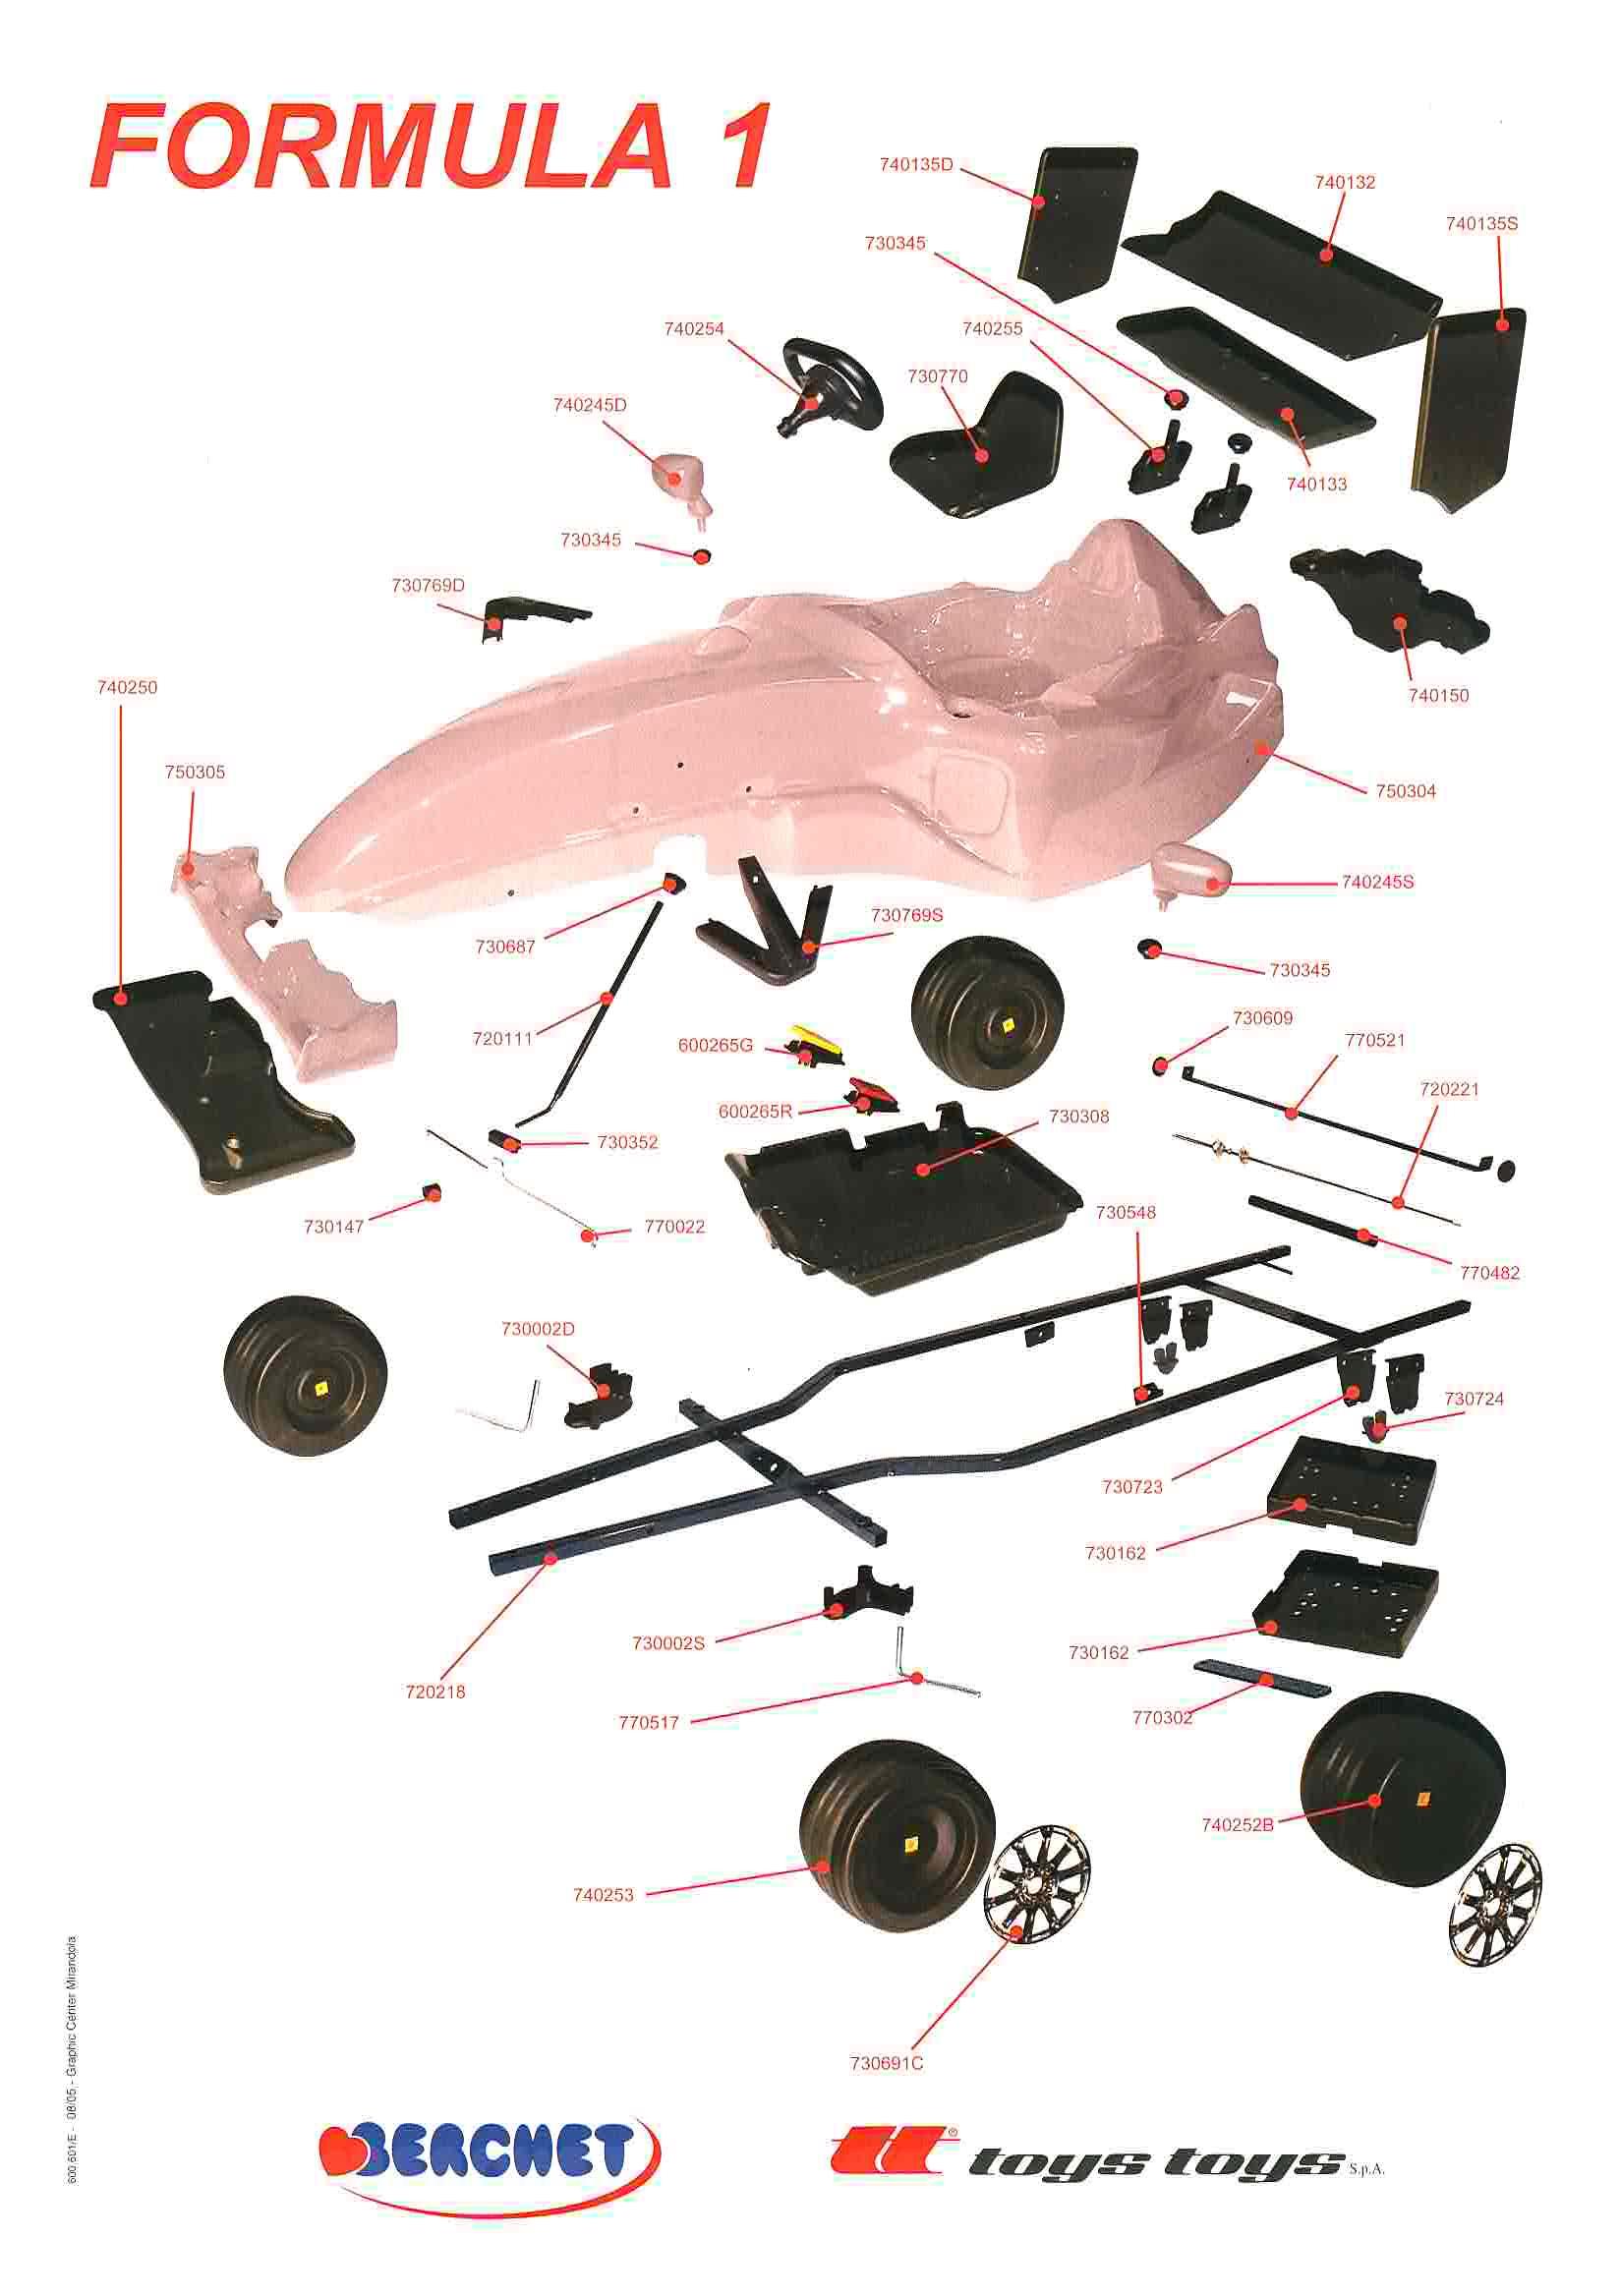 apc mini chopper wiring diagram chevy tahoe interior bigtoysusa manuals aspx